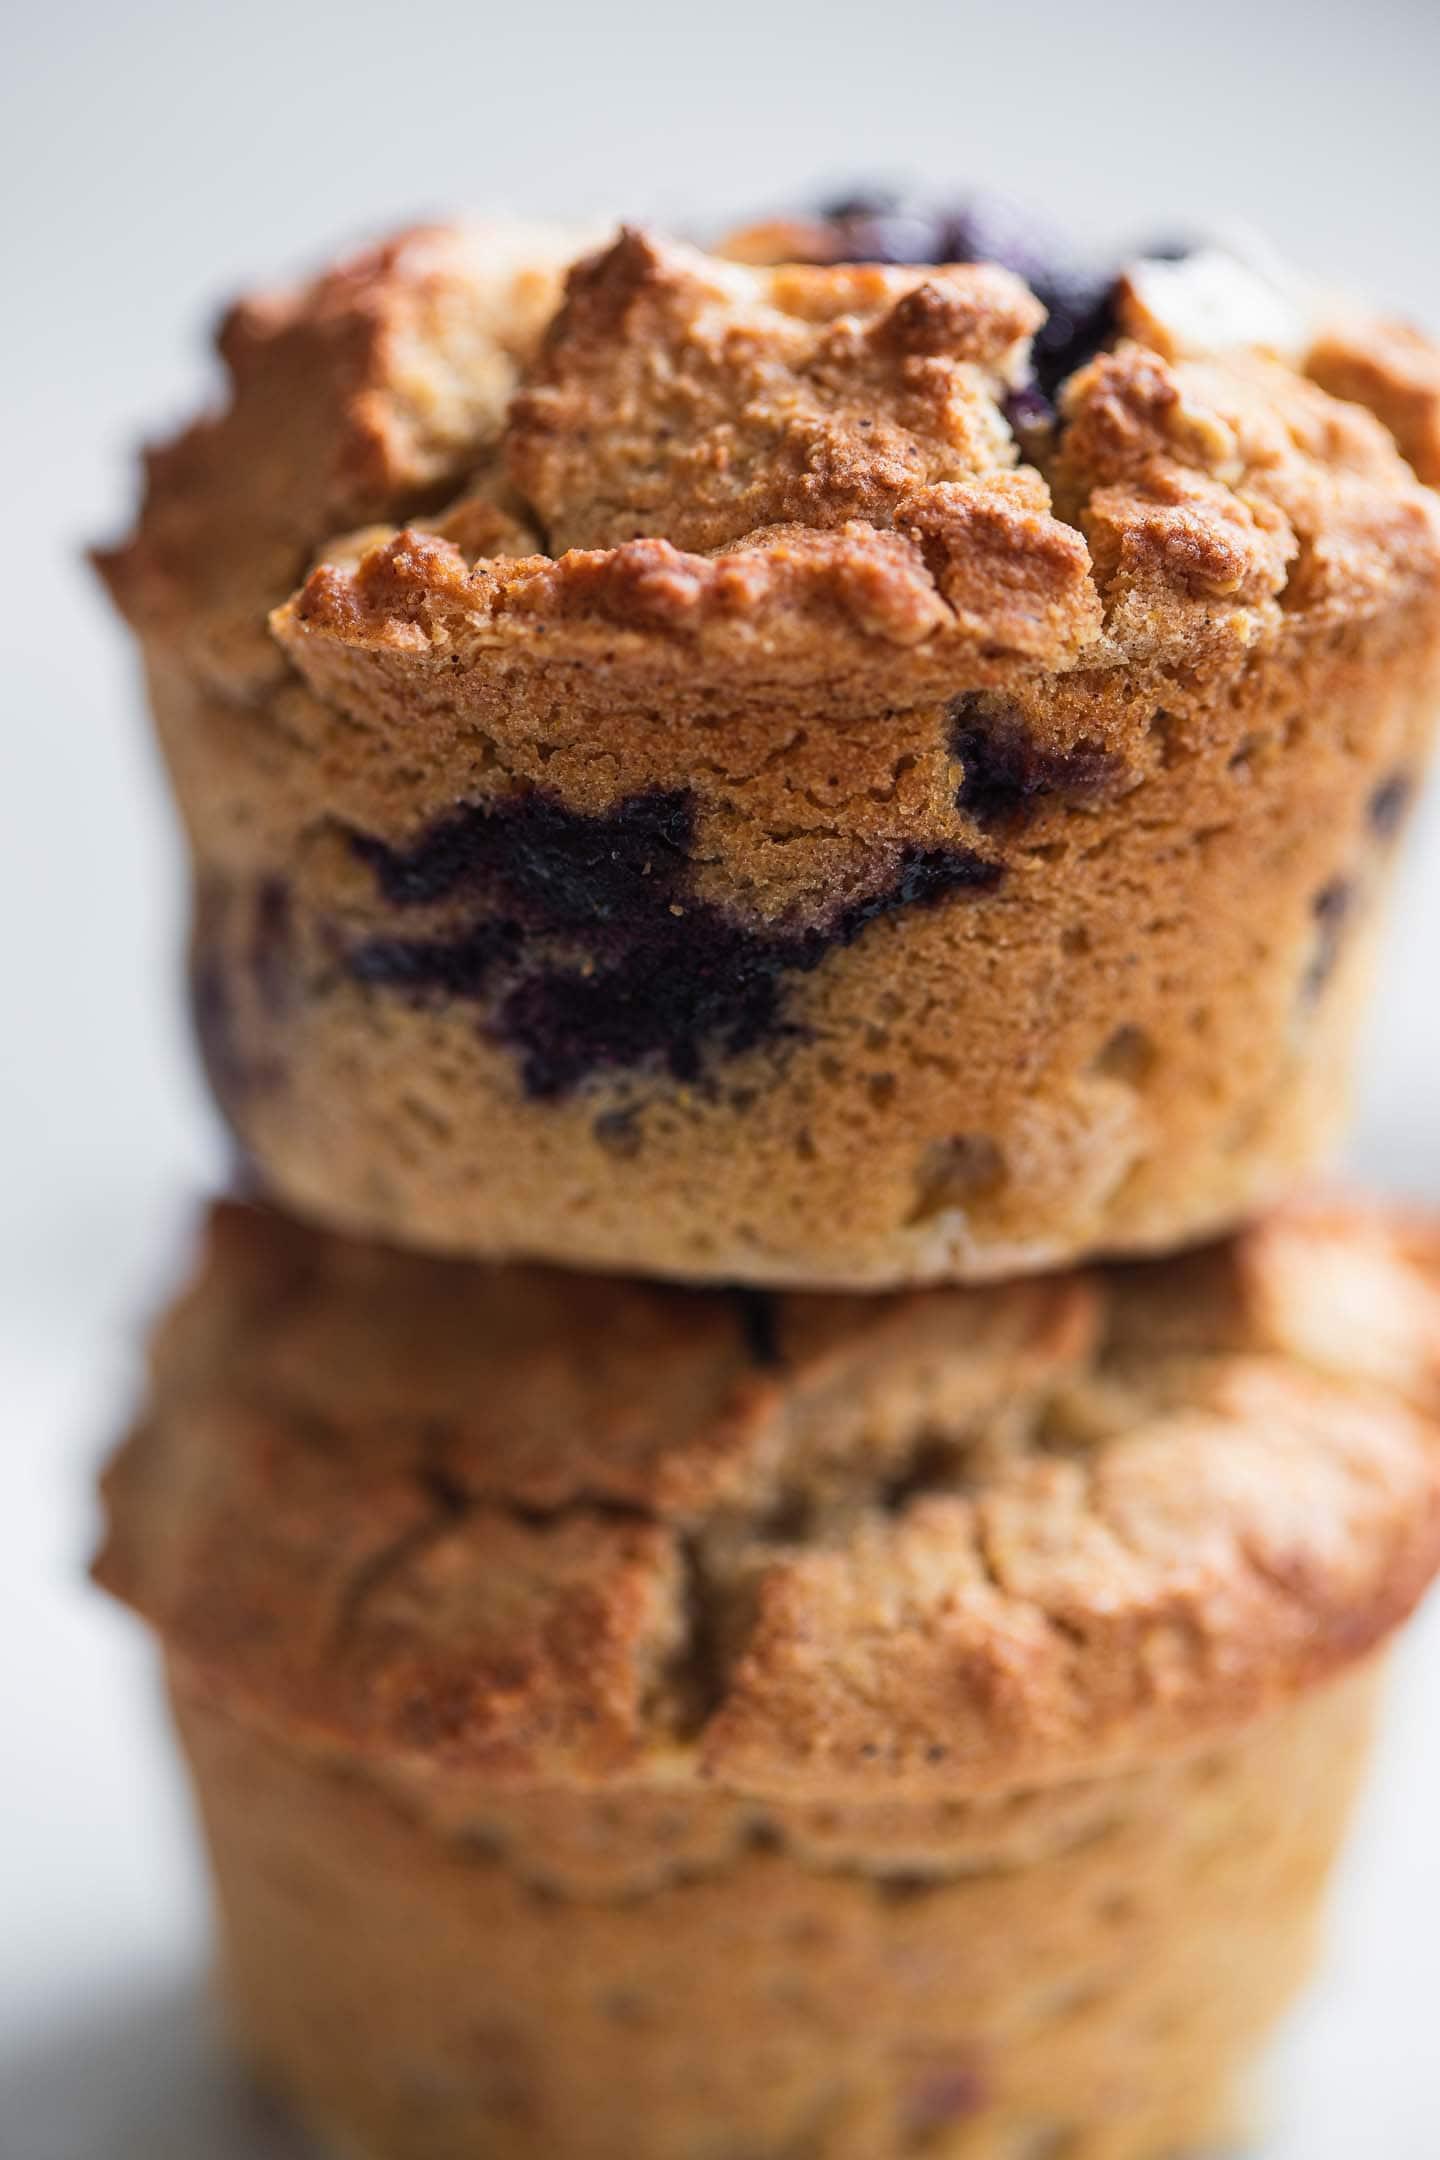 Closeup of vegan muffins on a plate